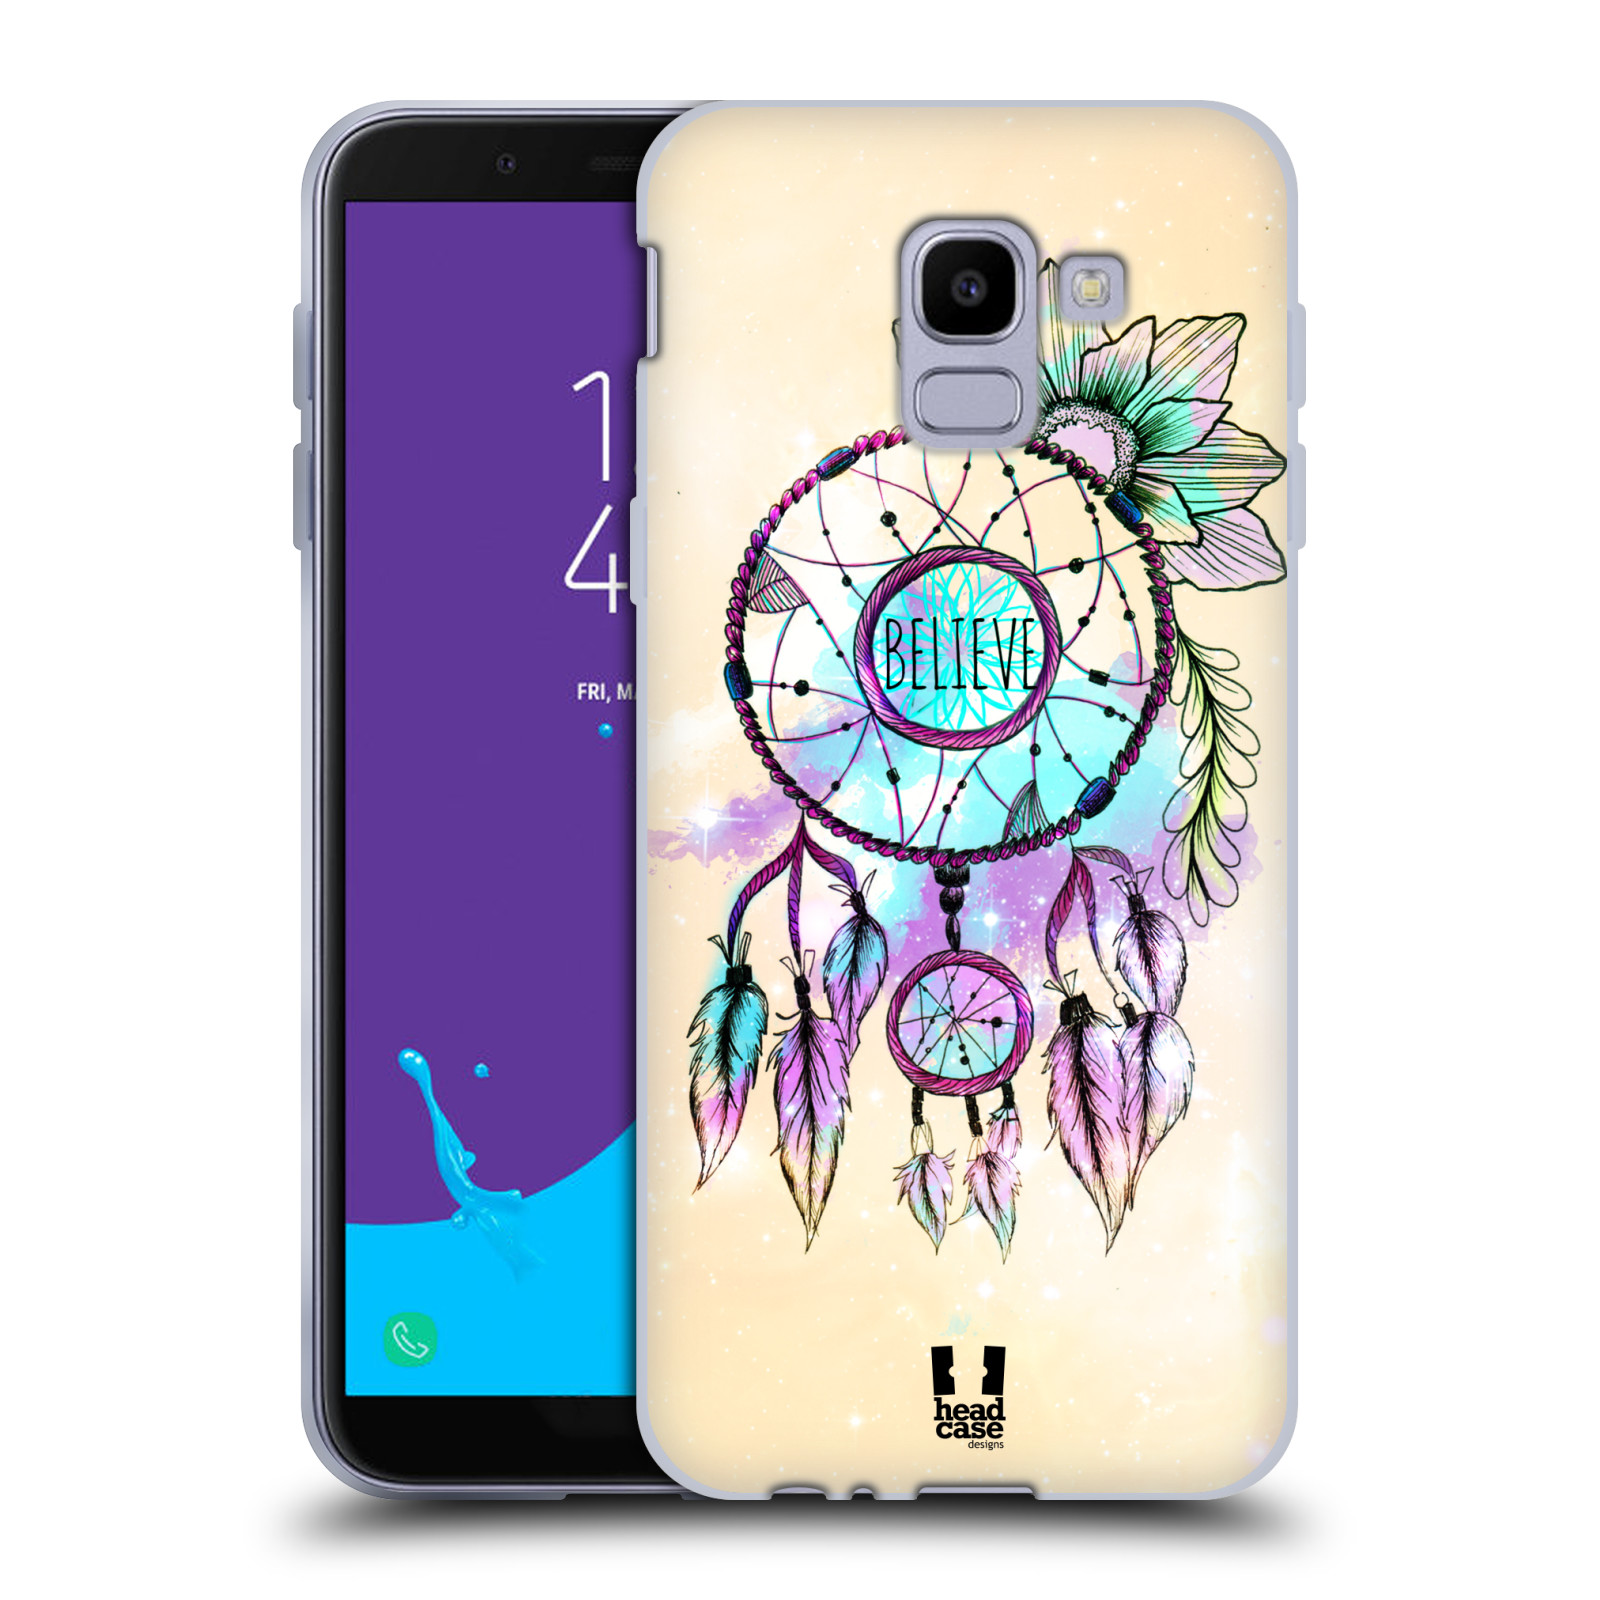 Silikonové pouzdro na mobil Samsung Galaxy J6 (2018) - Head Case - MIX BELIEVE